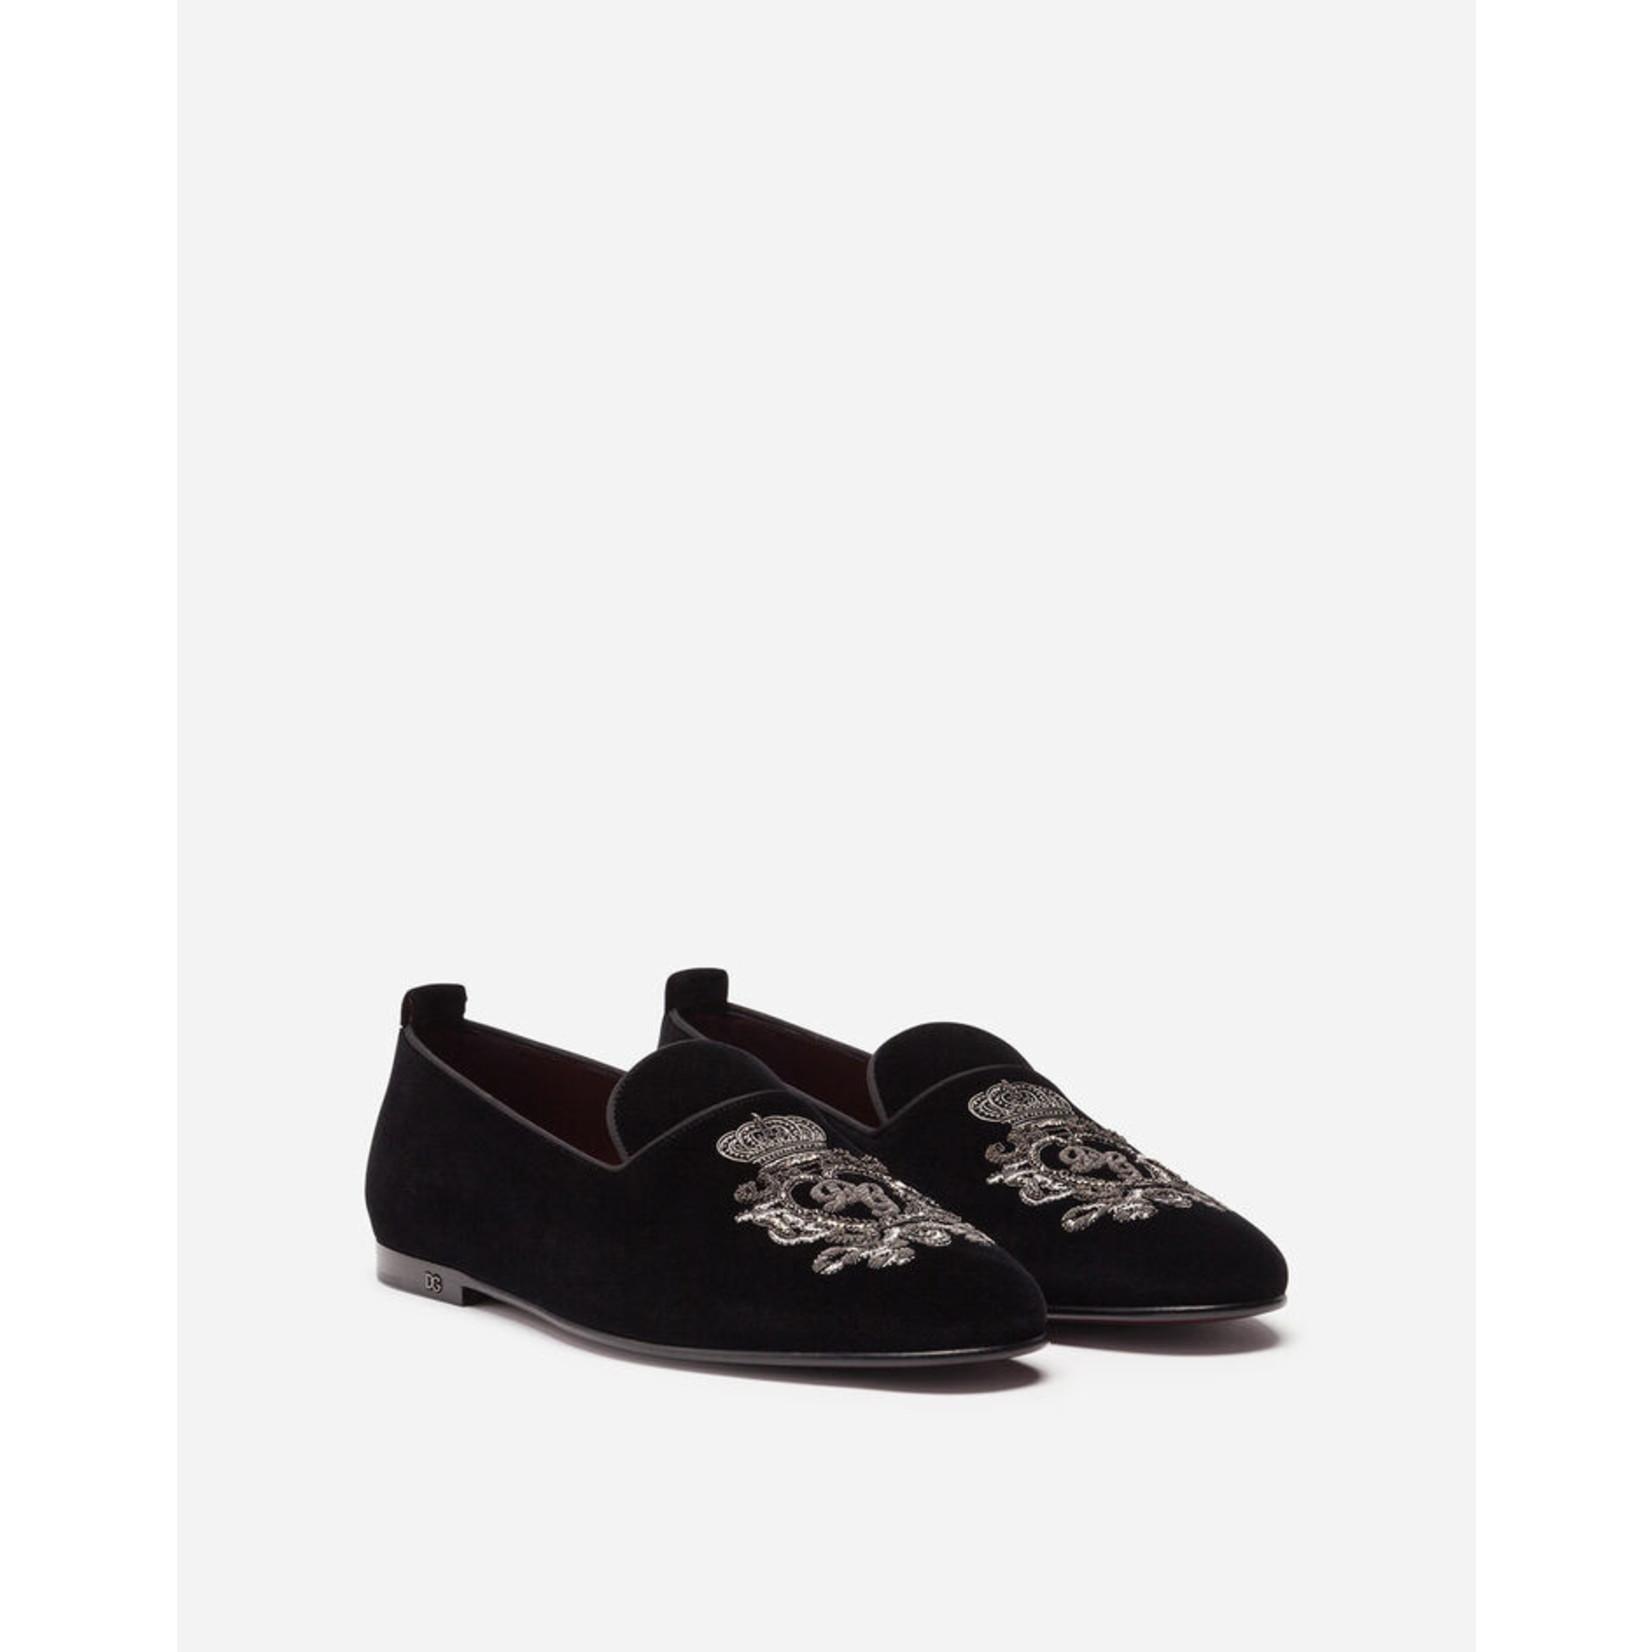 Dolce&Gabbana schoenen Schoenen 39802